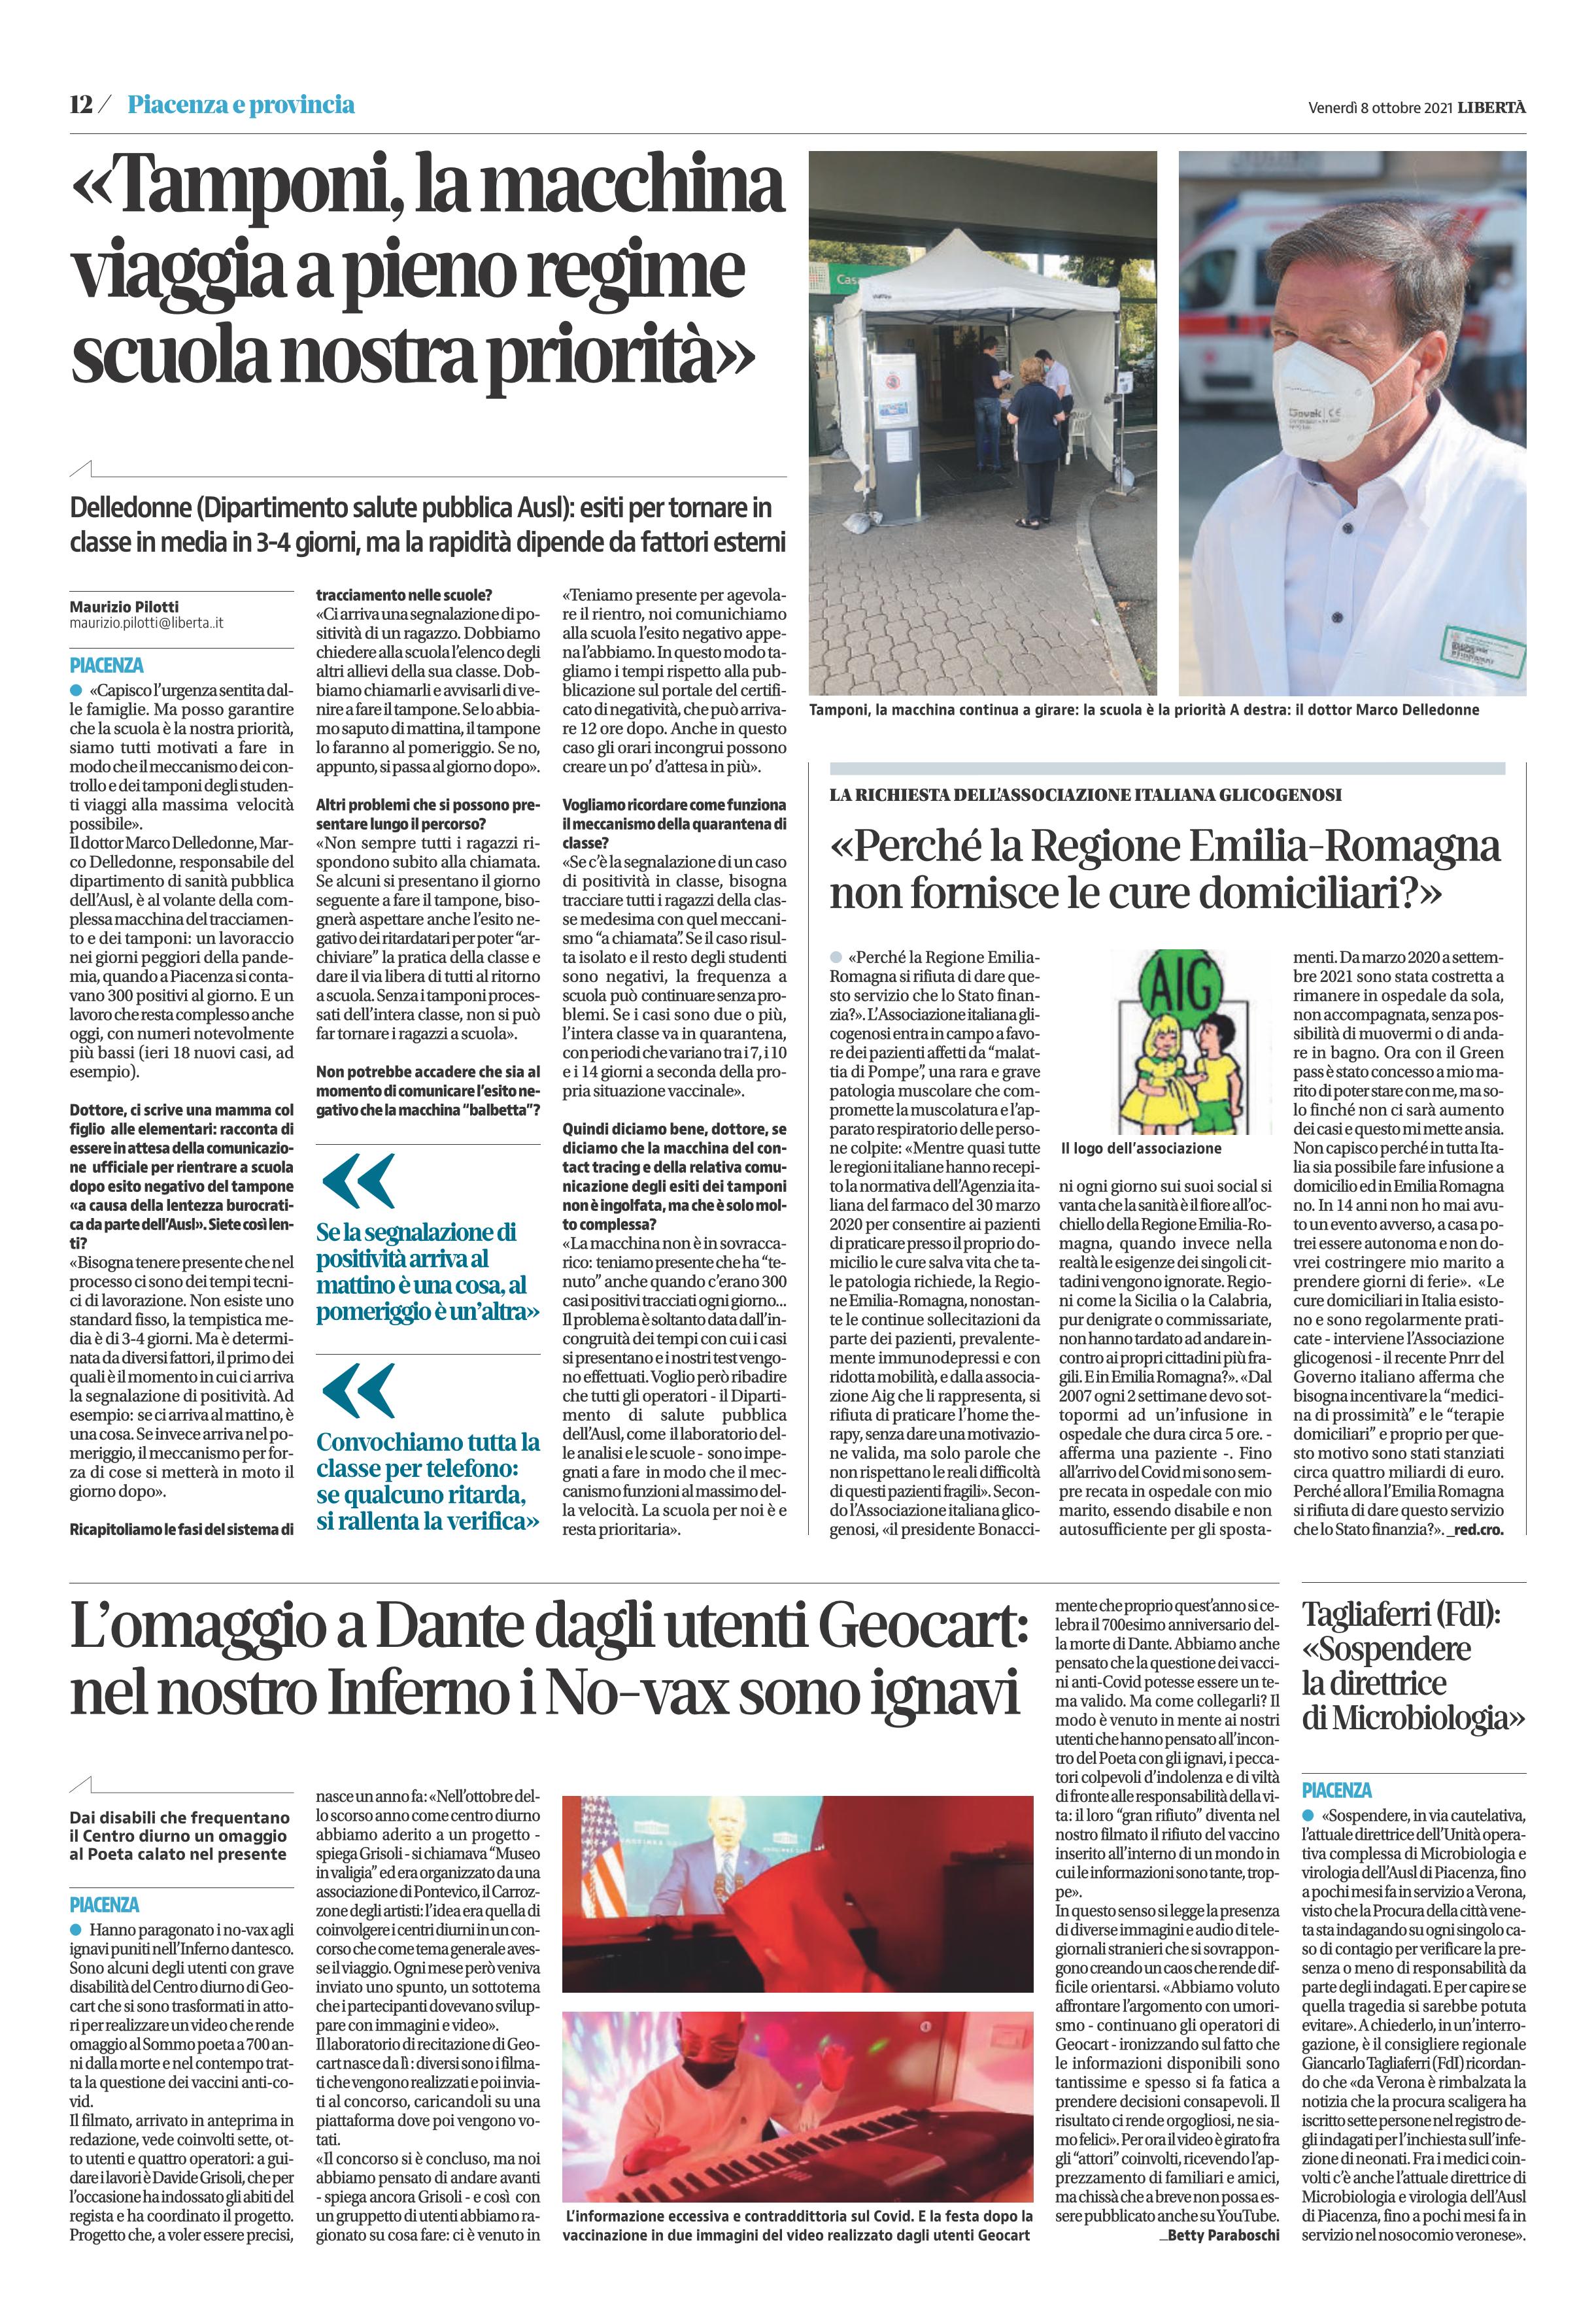 Stampa_20211008_libertà_Page_1